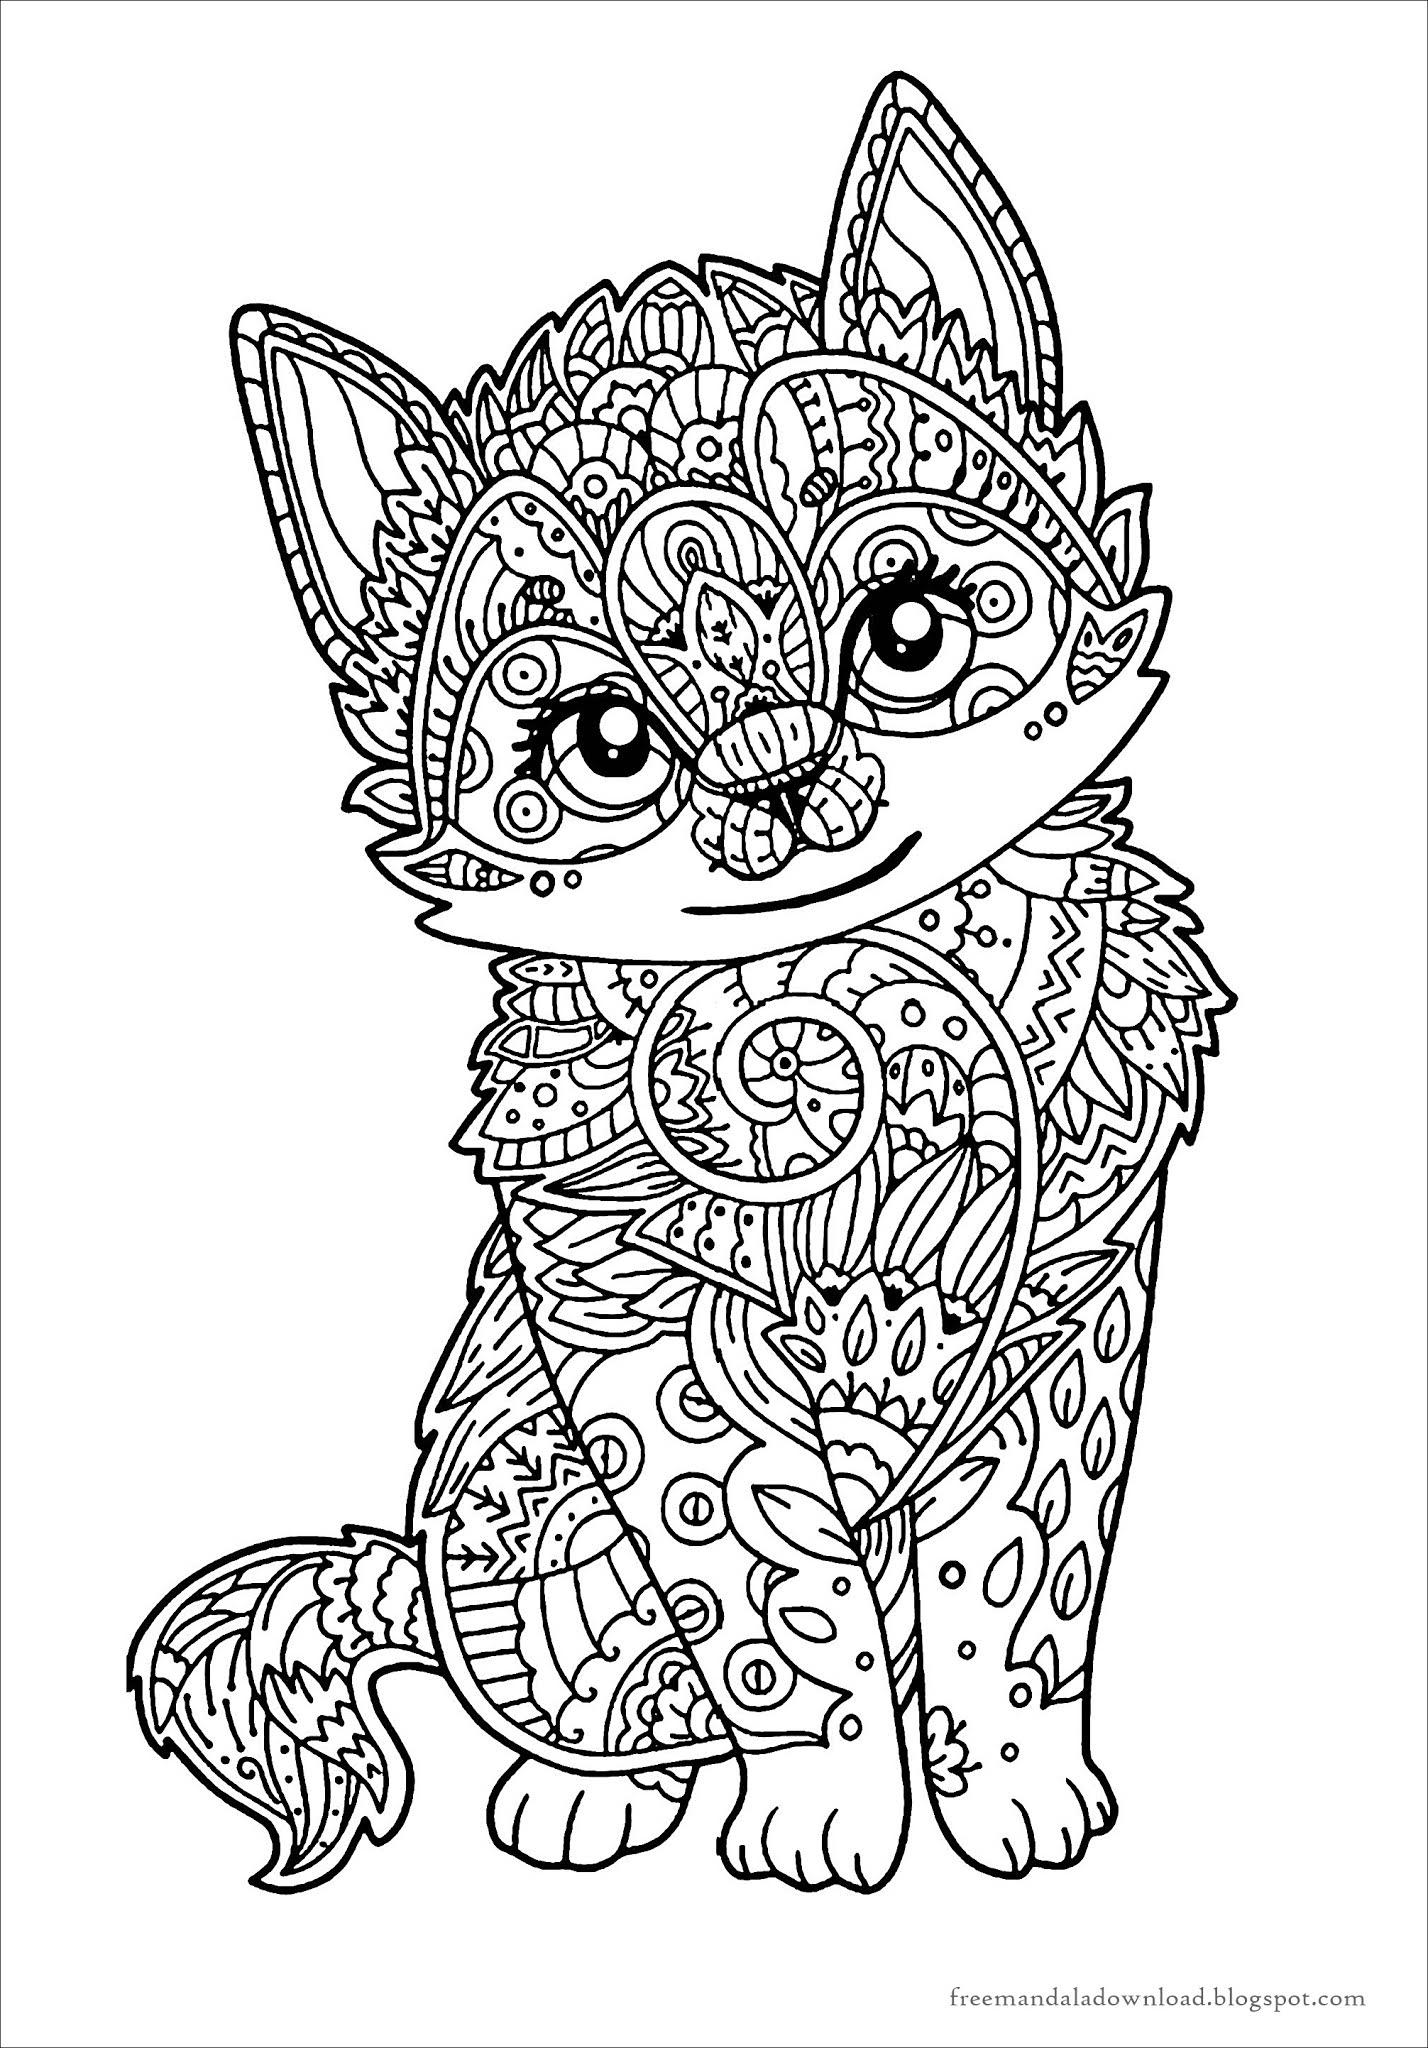 katzen mandala malbuch pdfcats mandala coloring book pdf